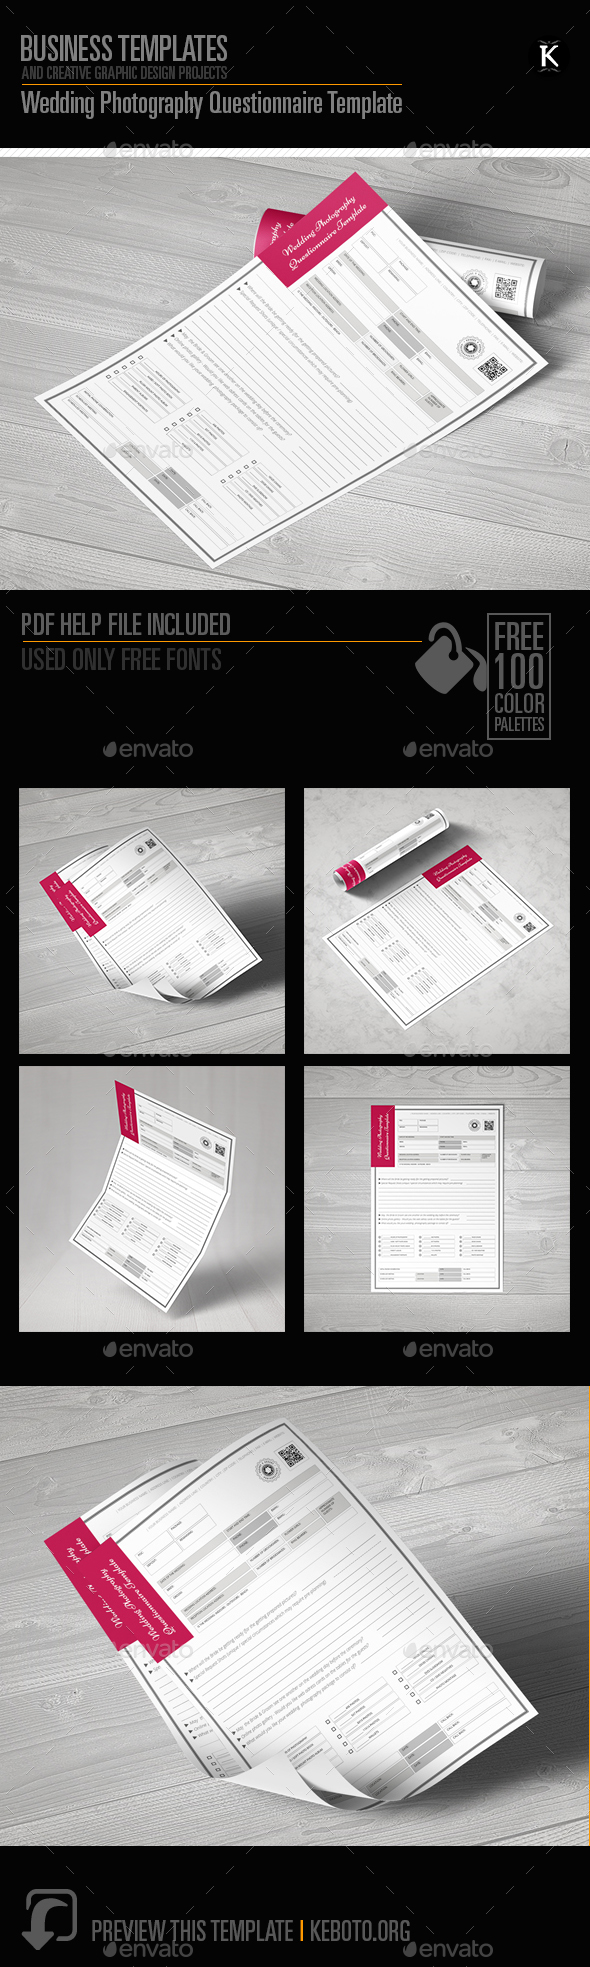 Questionnaire Template Graphics, Designs & Templates